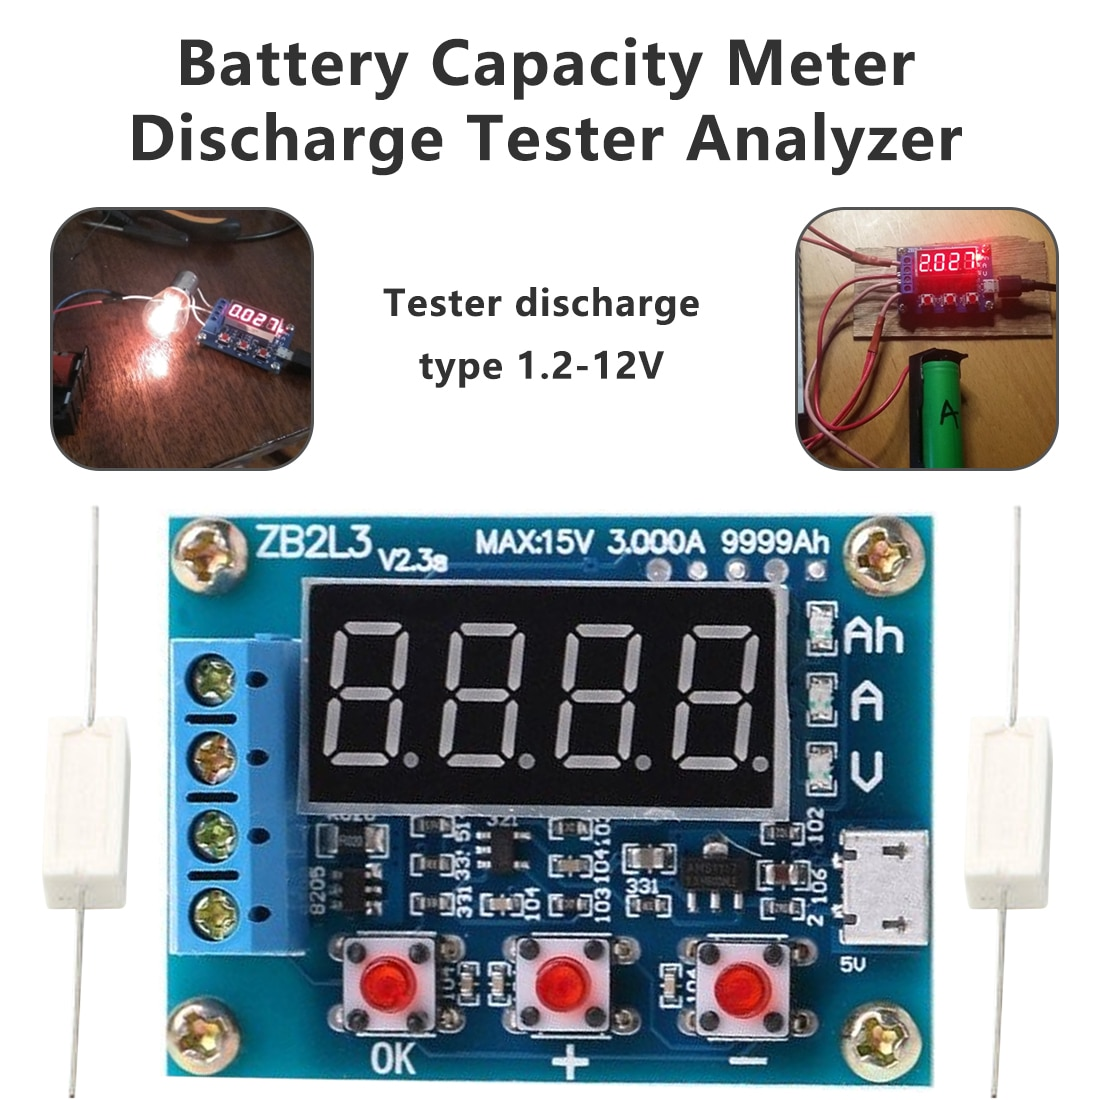 1.2v 12v ZB2L3 18650 Li-ion Lithium Battery Capacity Tester Battery Charging Indicator